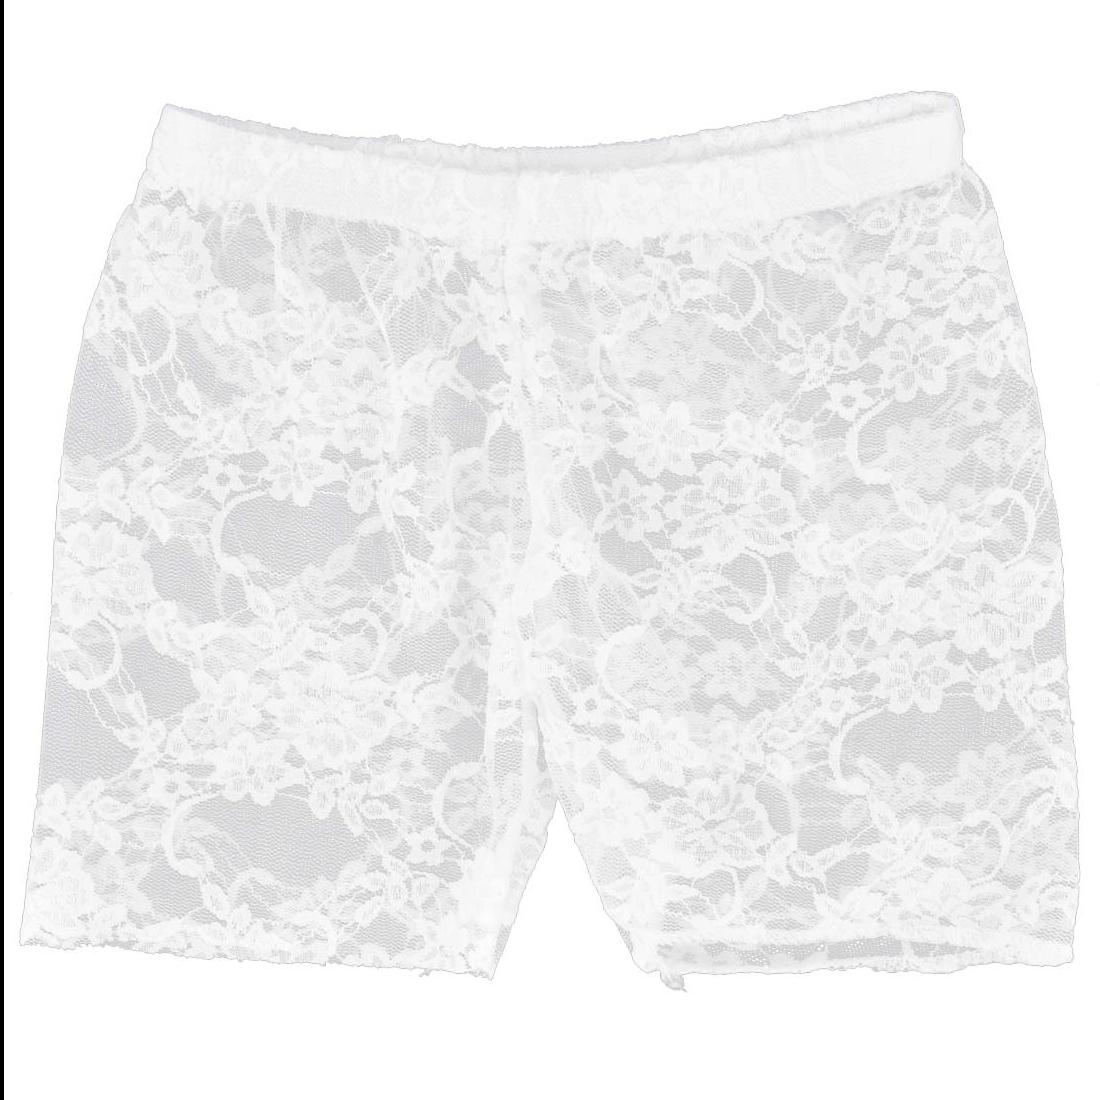 Women Floral Lace Semi Sheer Safety Shorts Pants Leggings White XS